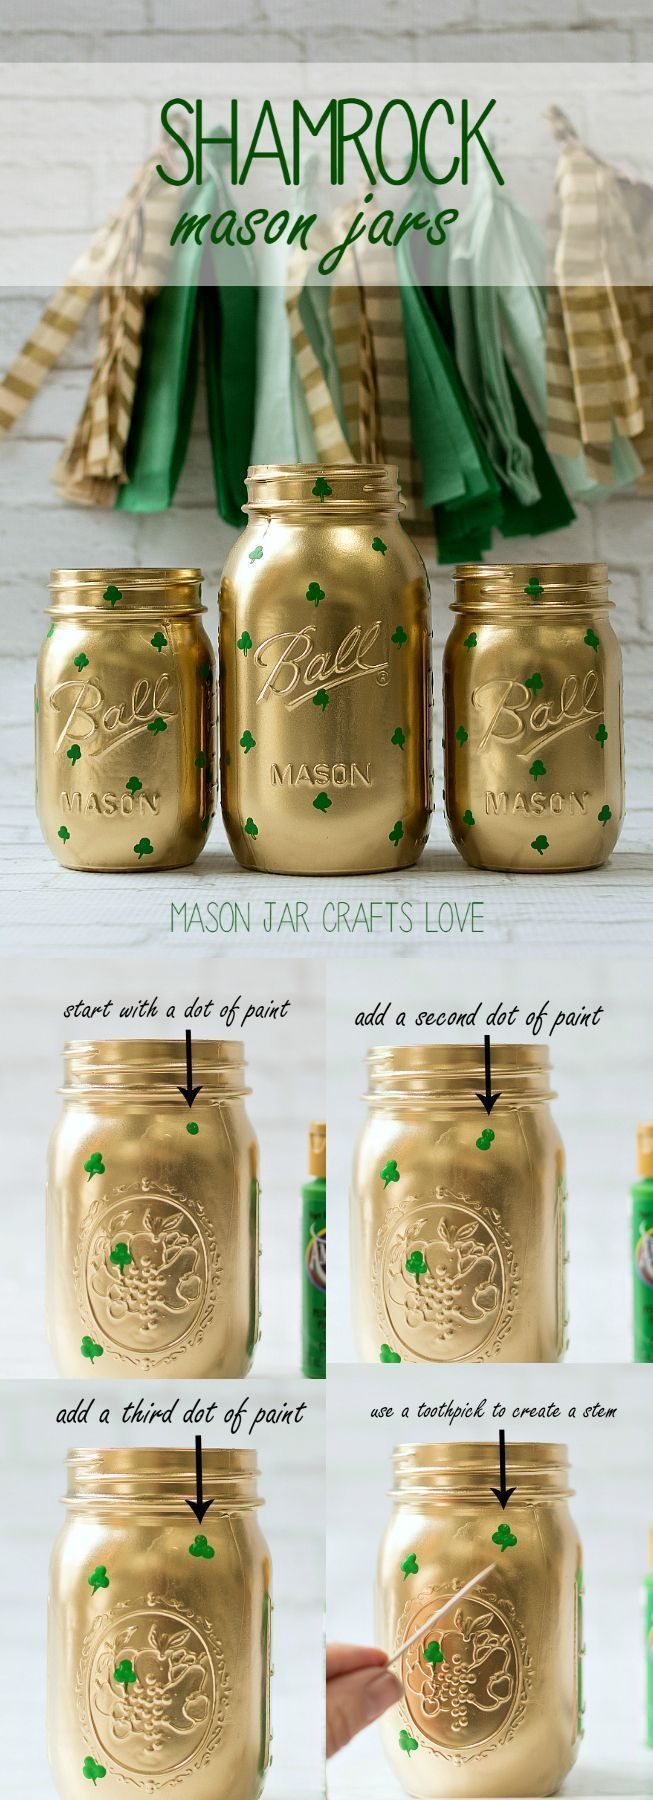 St Patrick's Day Craft Idea with Mason Jars - Shamrock Mason Jar DIY - St Patrick's Day Decor & Party Decor Ideas to DIY